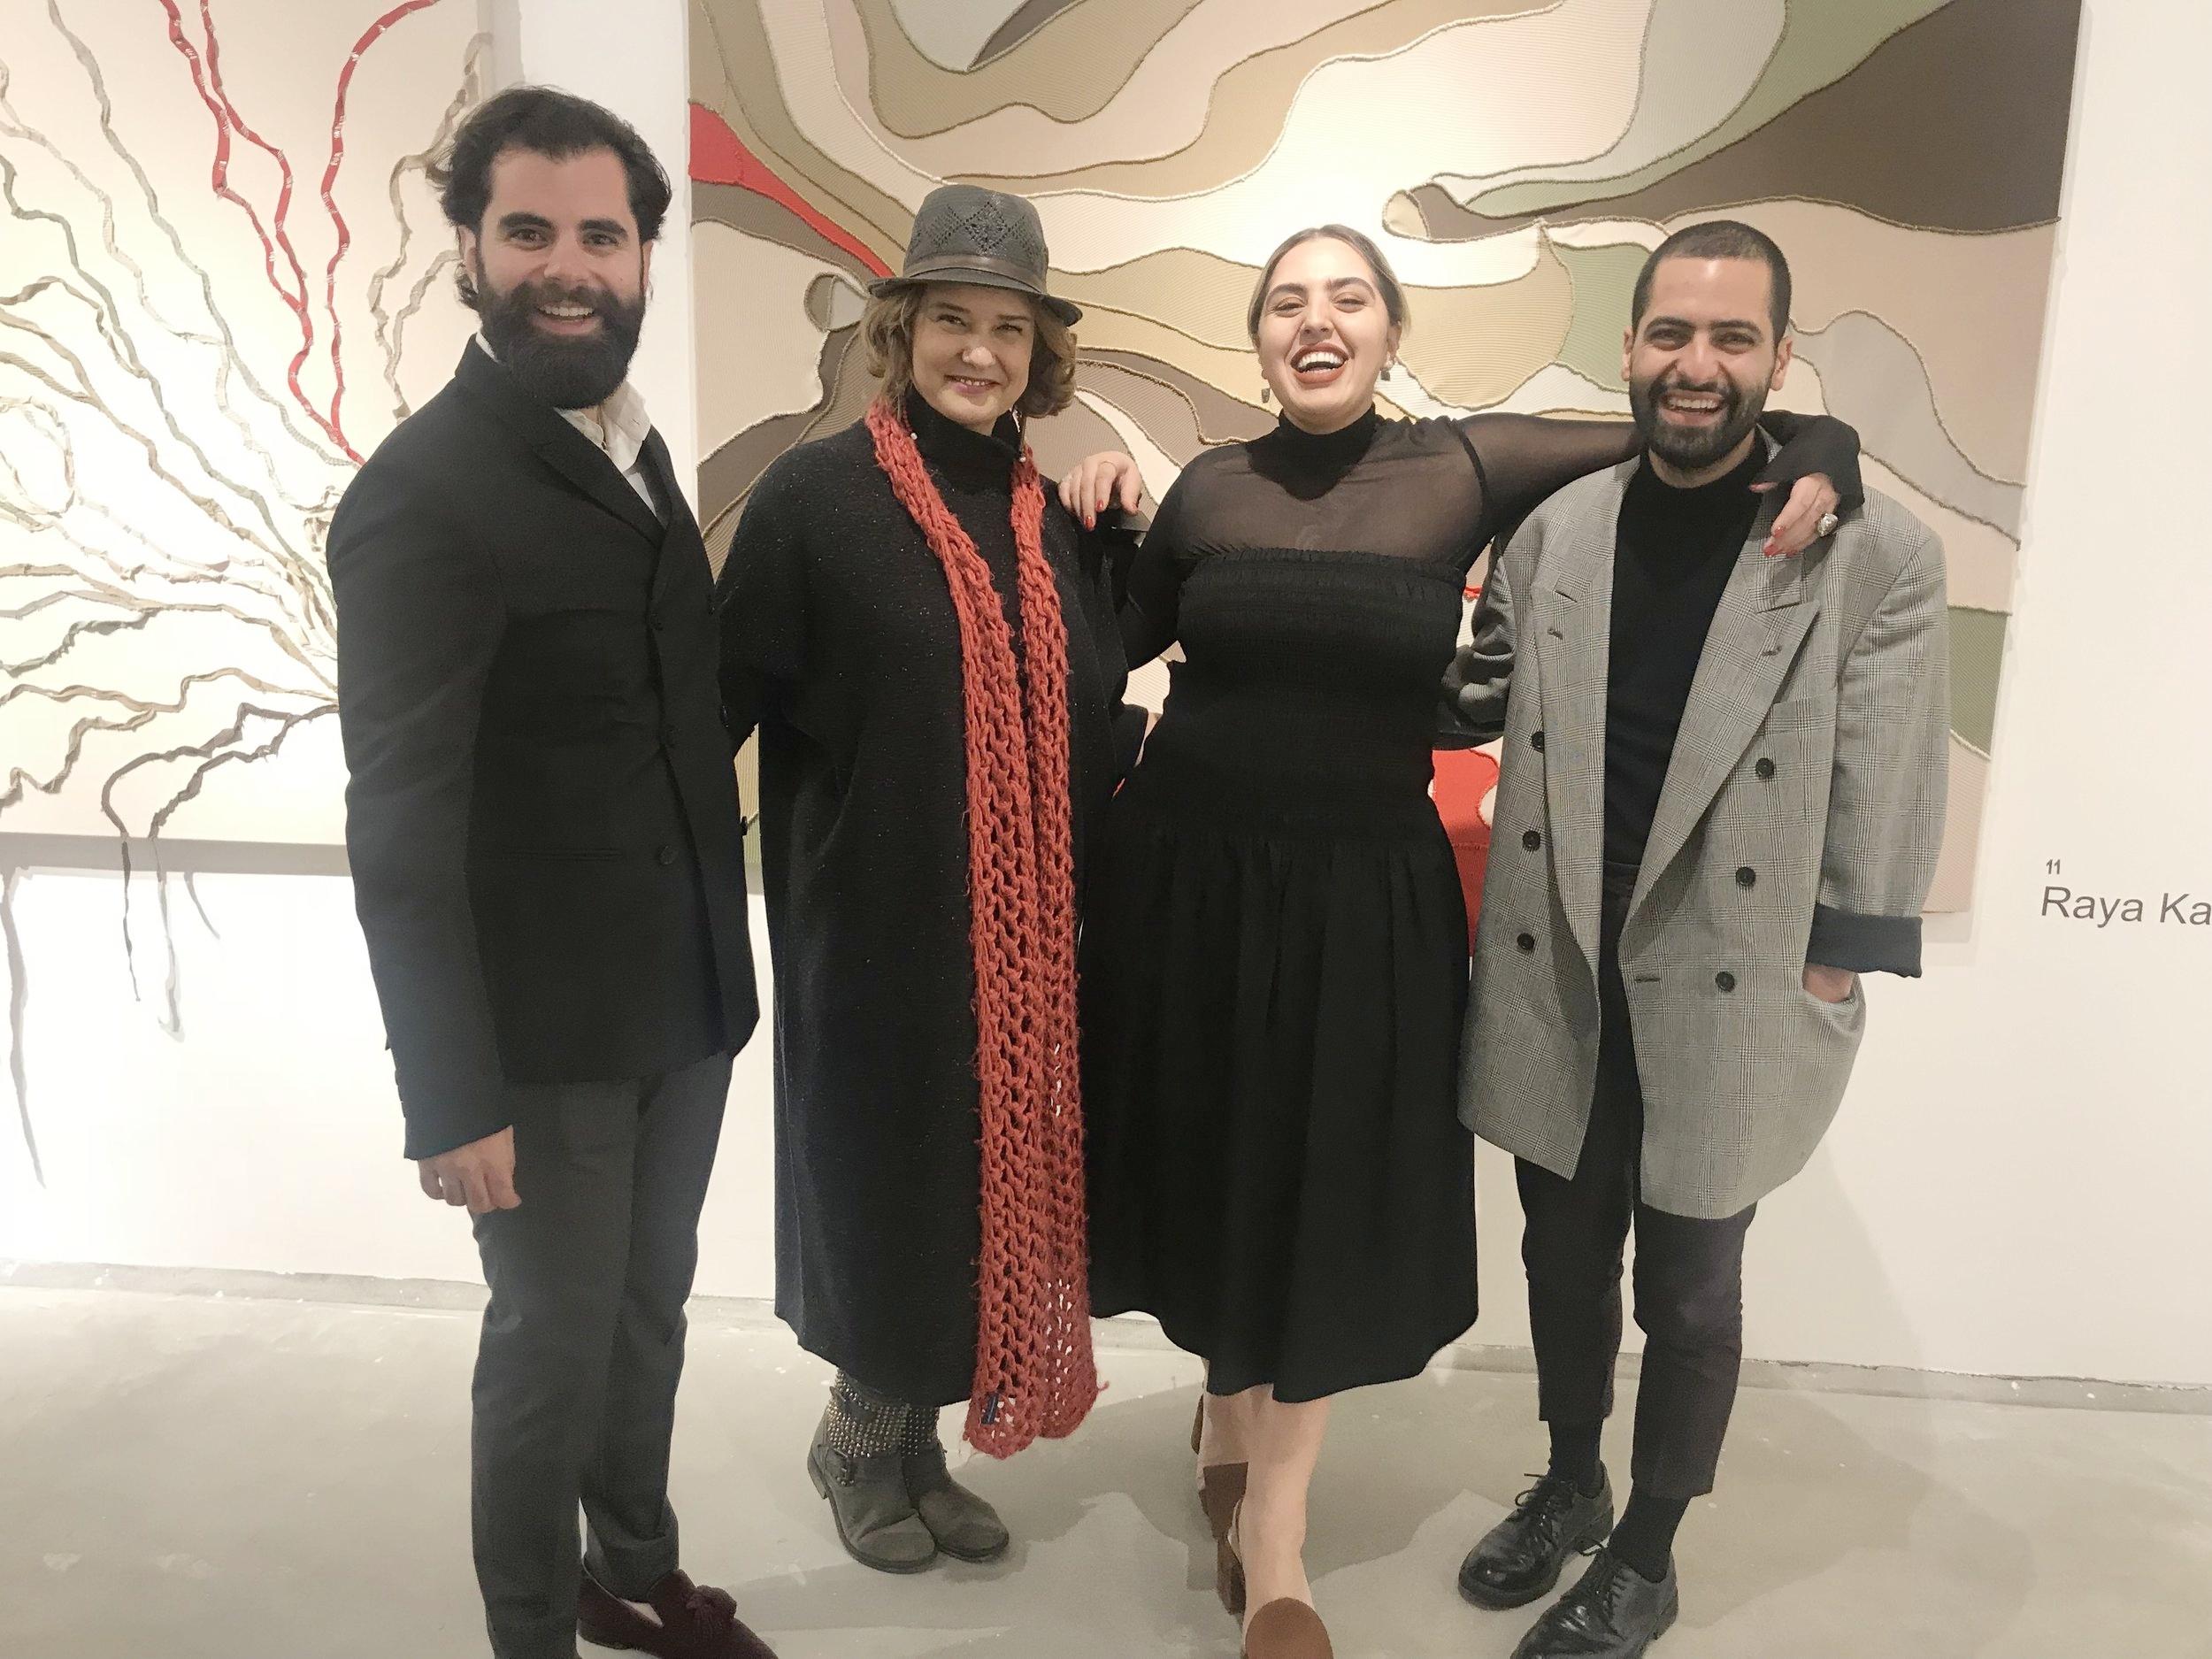 with our young talents, designers Raya Kassisieh, Fadi Zumot, and Zaid Farouki